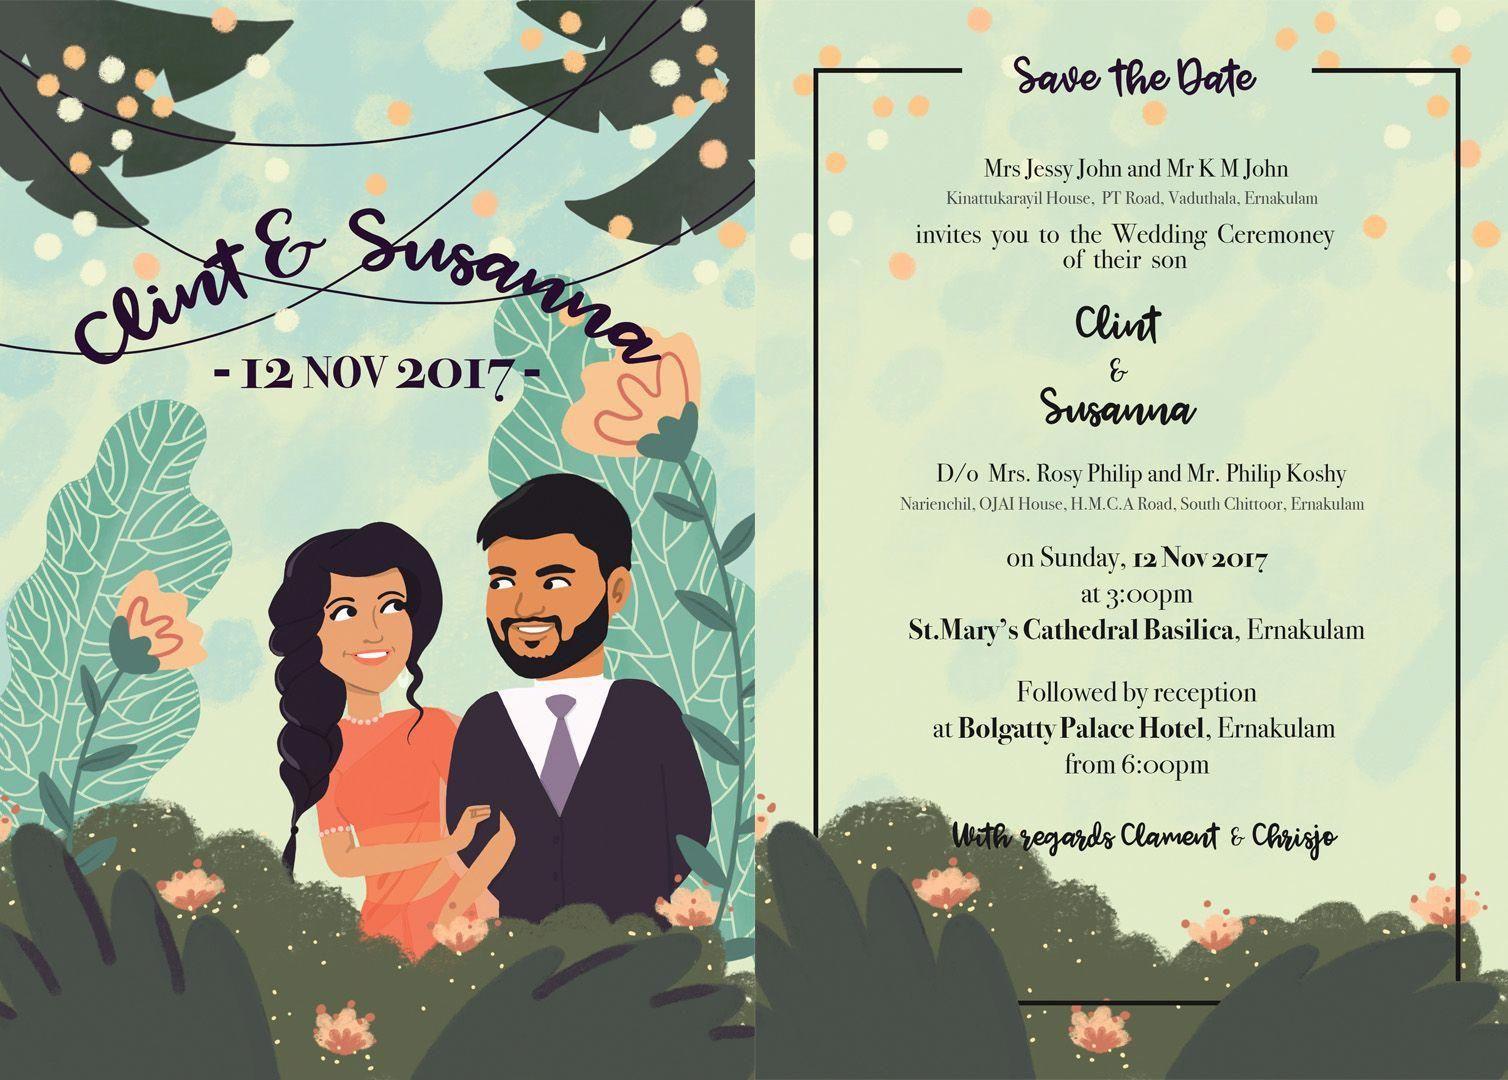 Blush Wedding Invitations Mint Cheapweddinginvitations Eco Friendly Wedding Invitations Illustrated Wedding Invitations Indian Wedding Invitation Cards